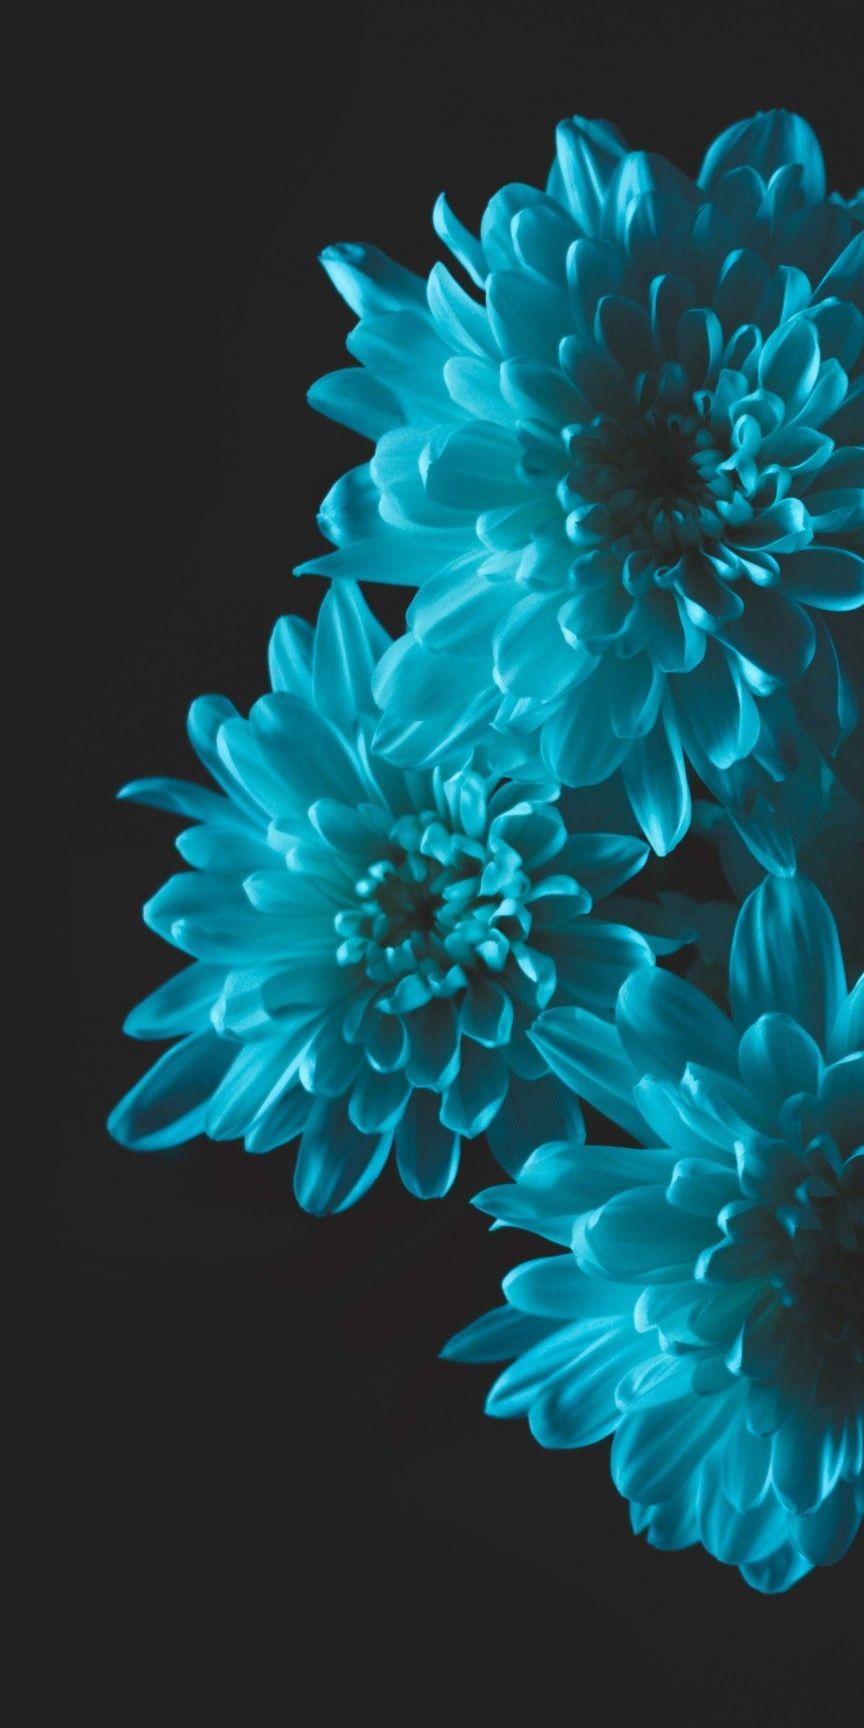 Black Background Wallpaper Flower Iphone Wallpaper Flower Phone Wallpaper Purple Flowers Wallpaper